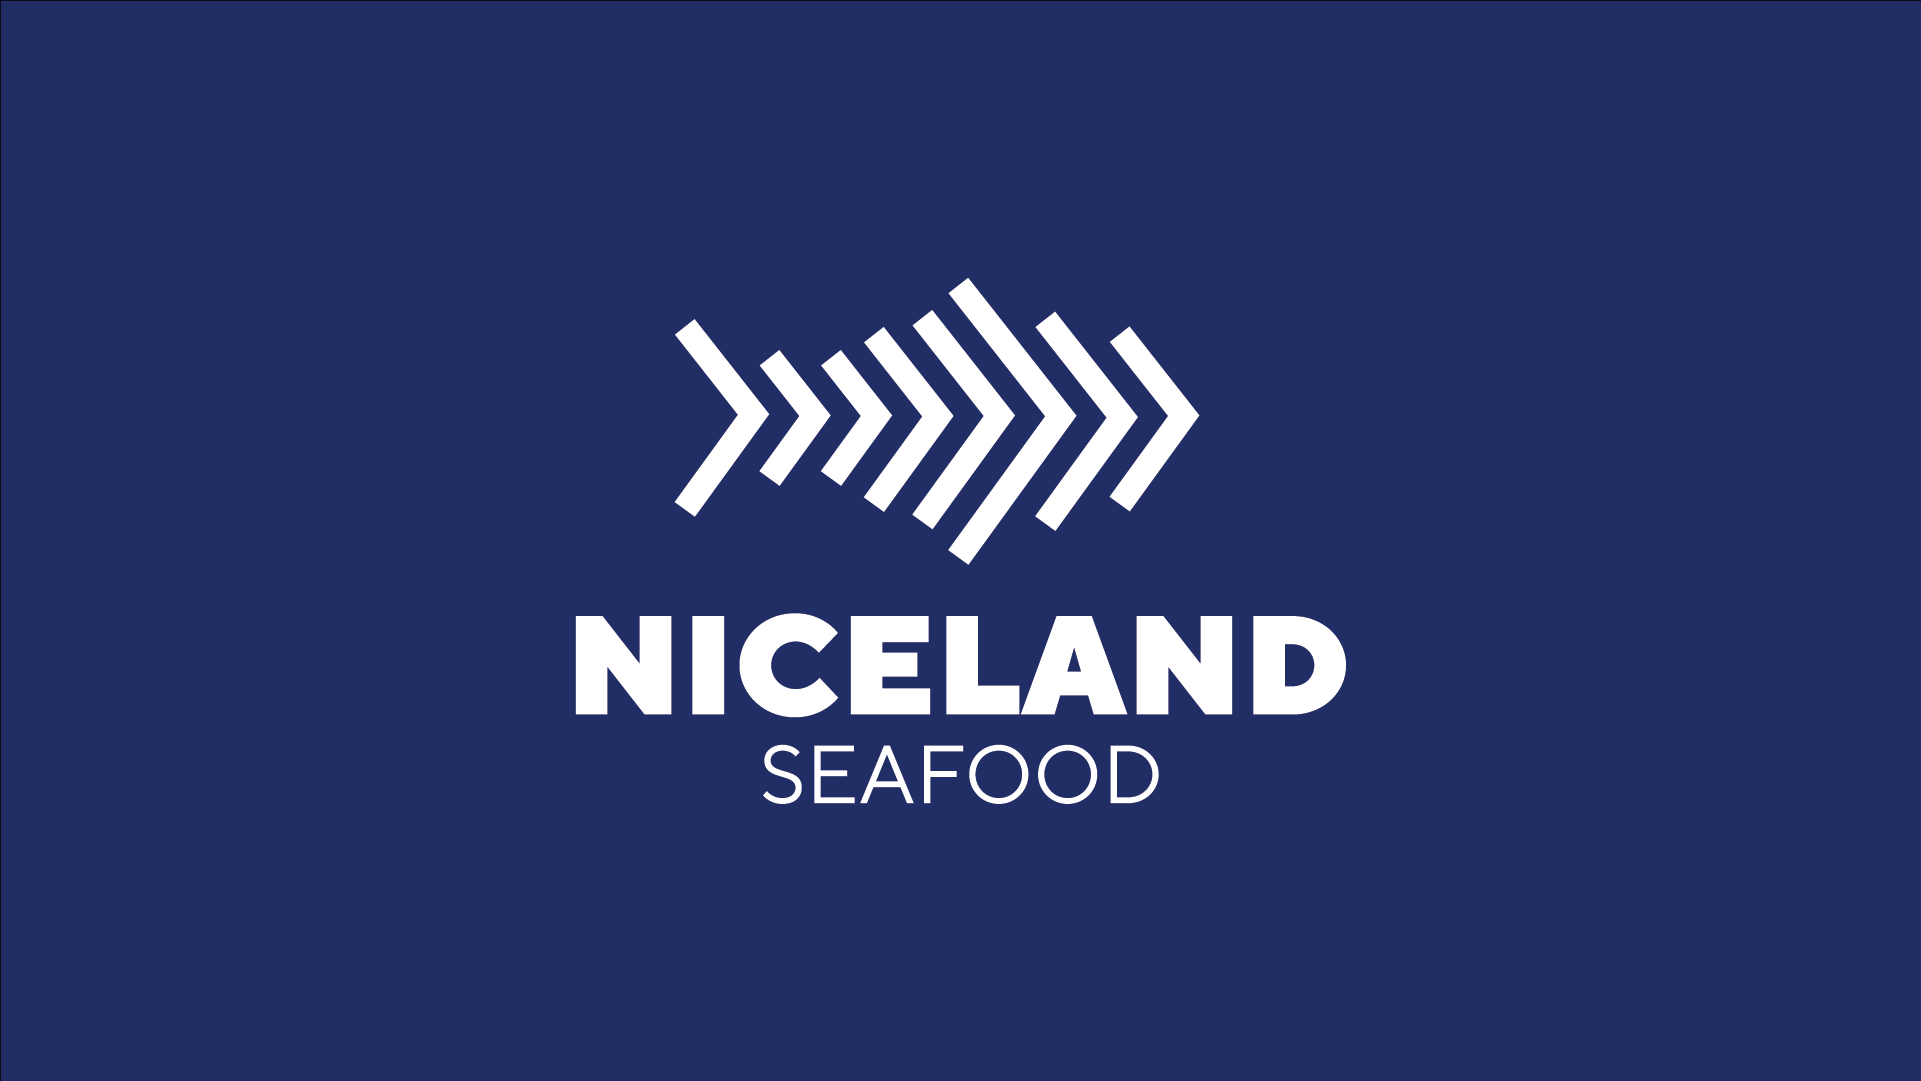 niceland_sea_logo copy-01.png